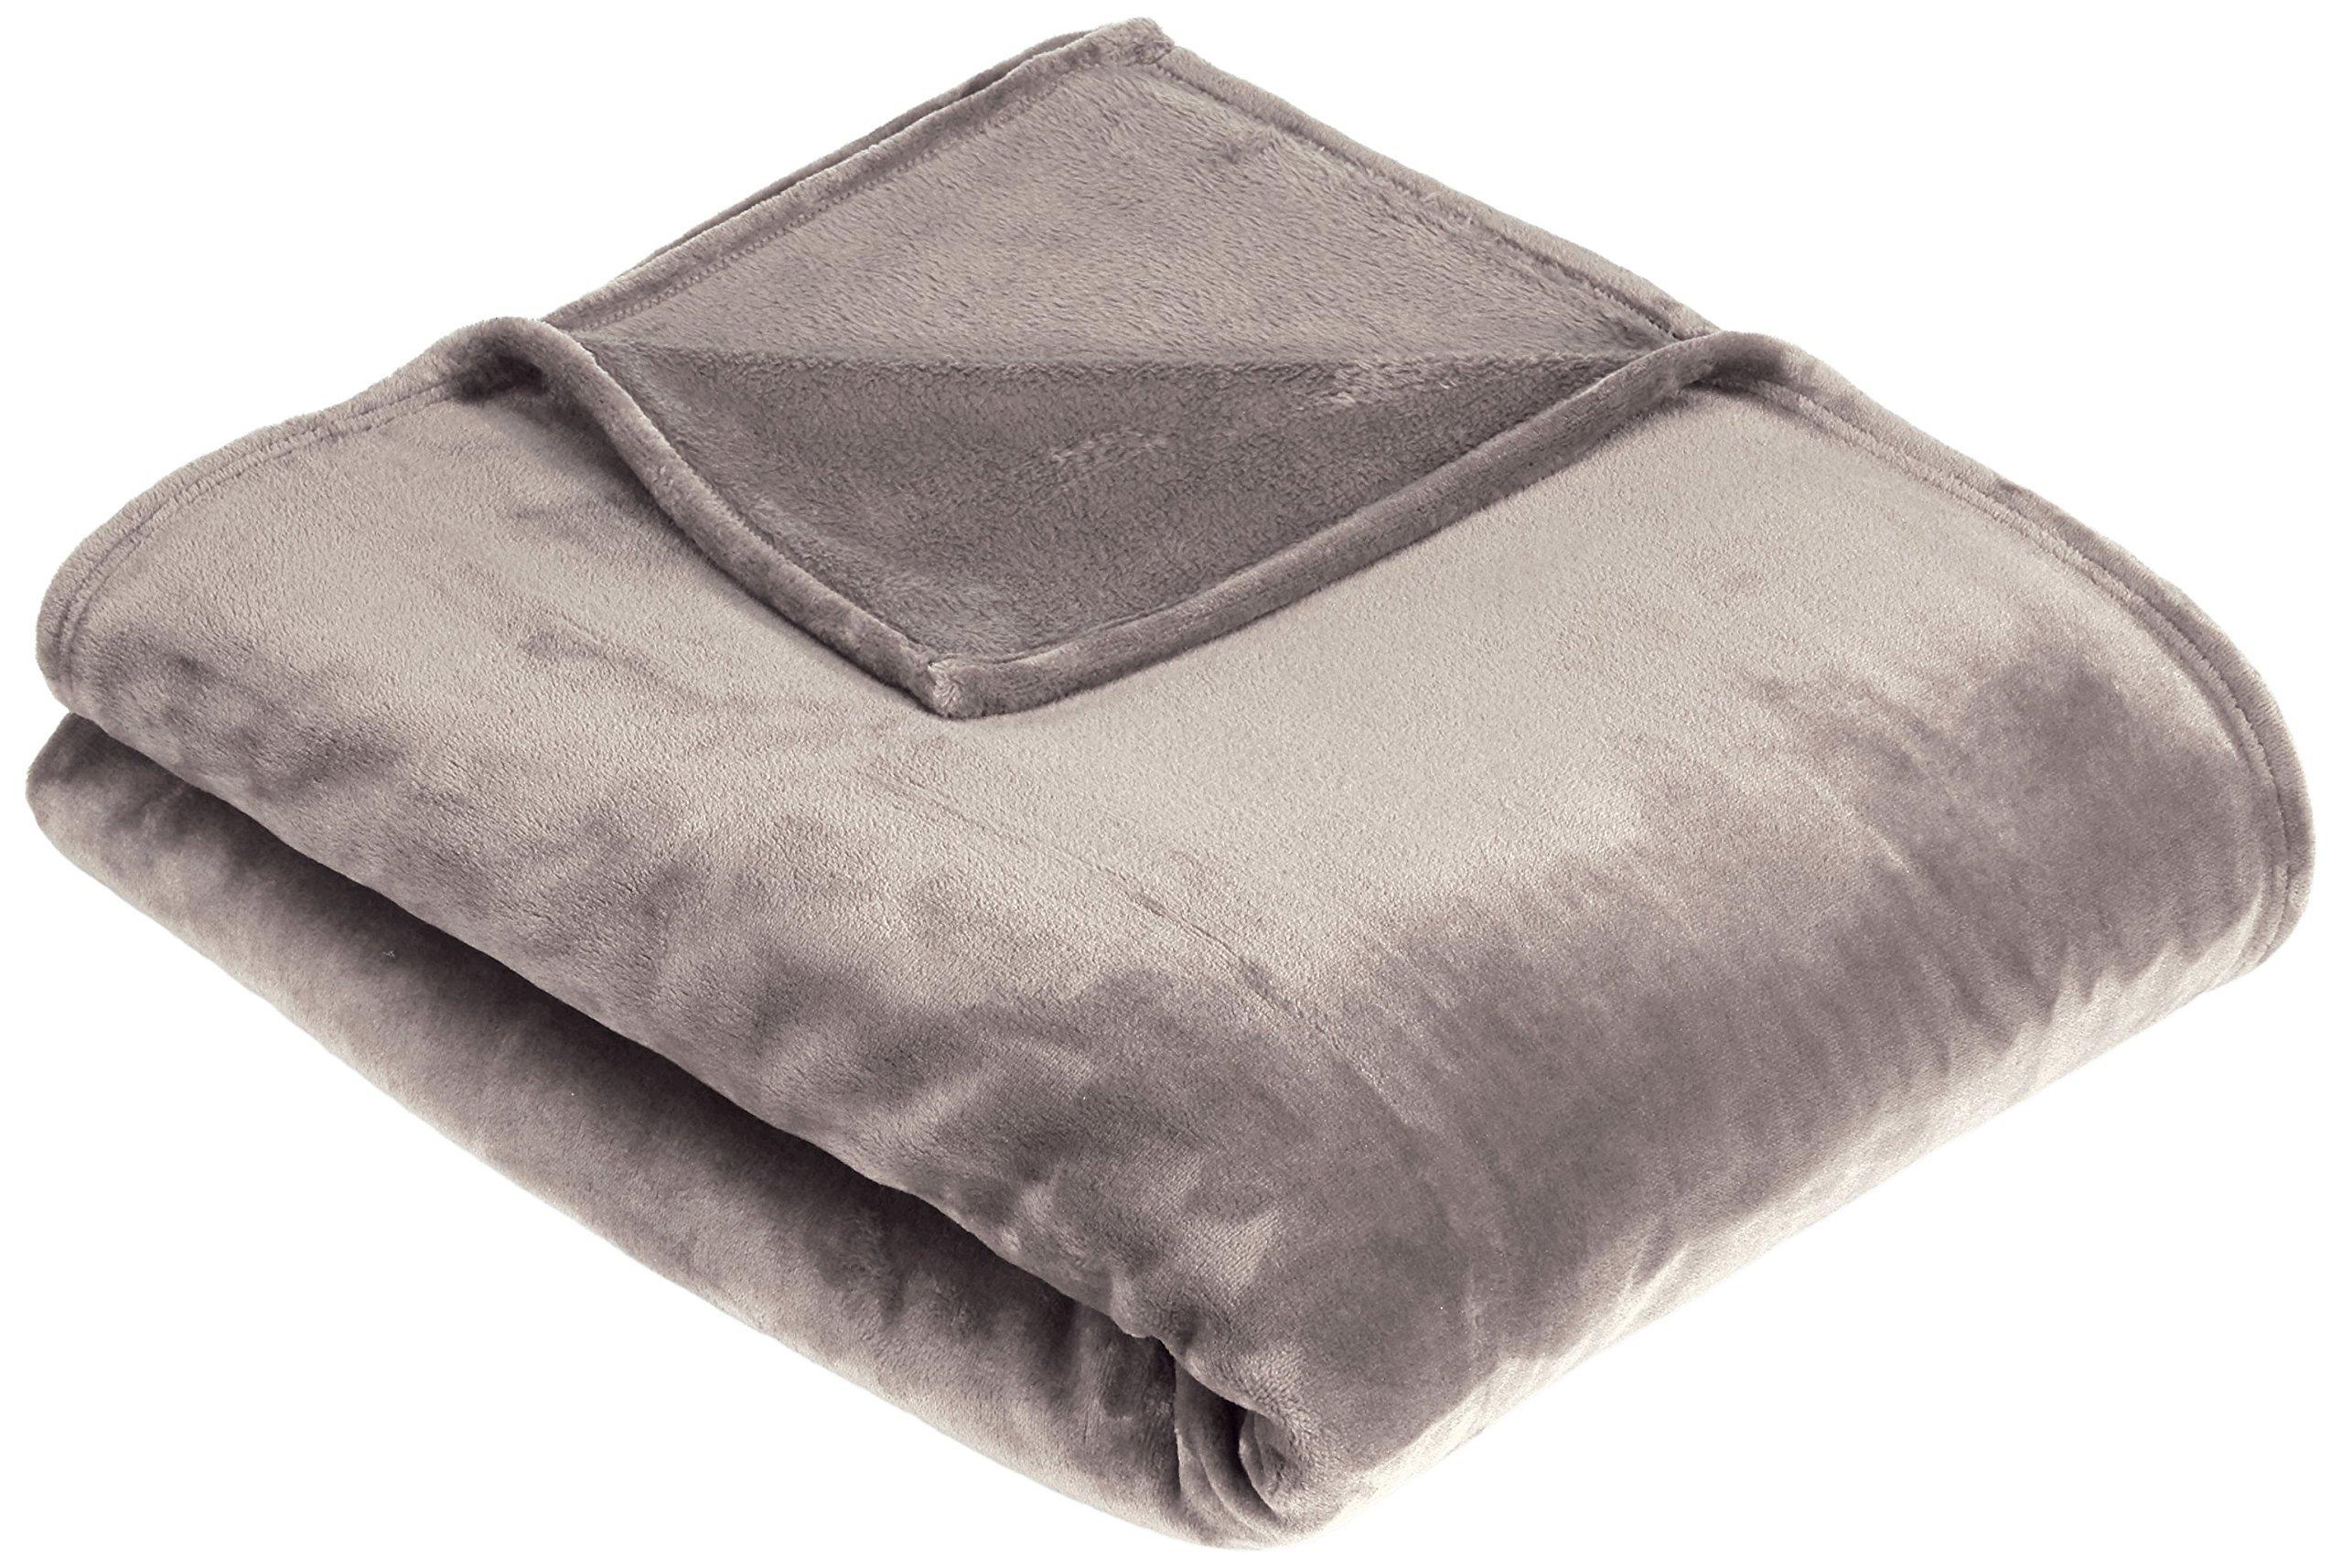 AmazonBasics - Manta suave con tacto de terciopelo, Doble, gris product image